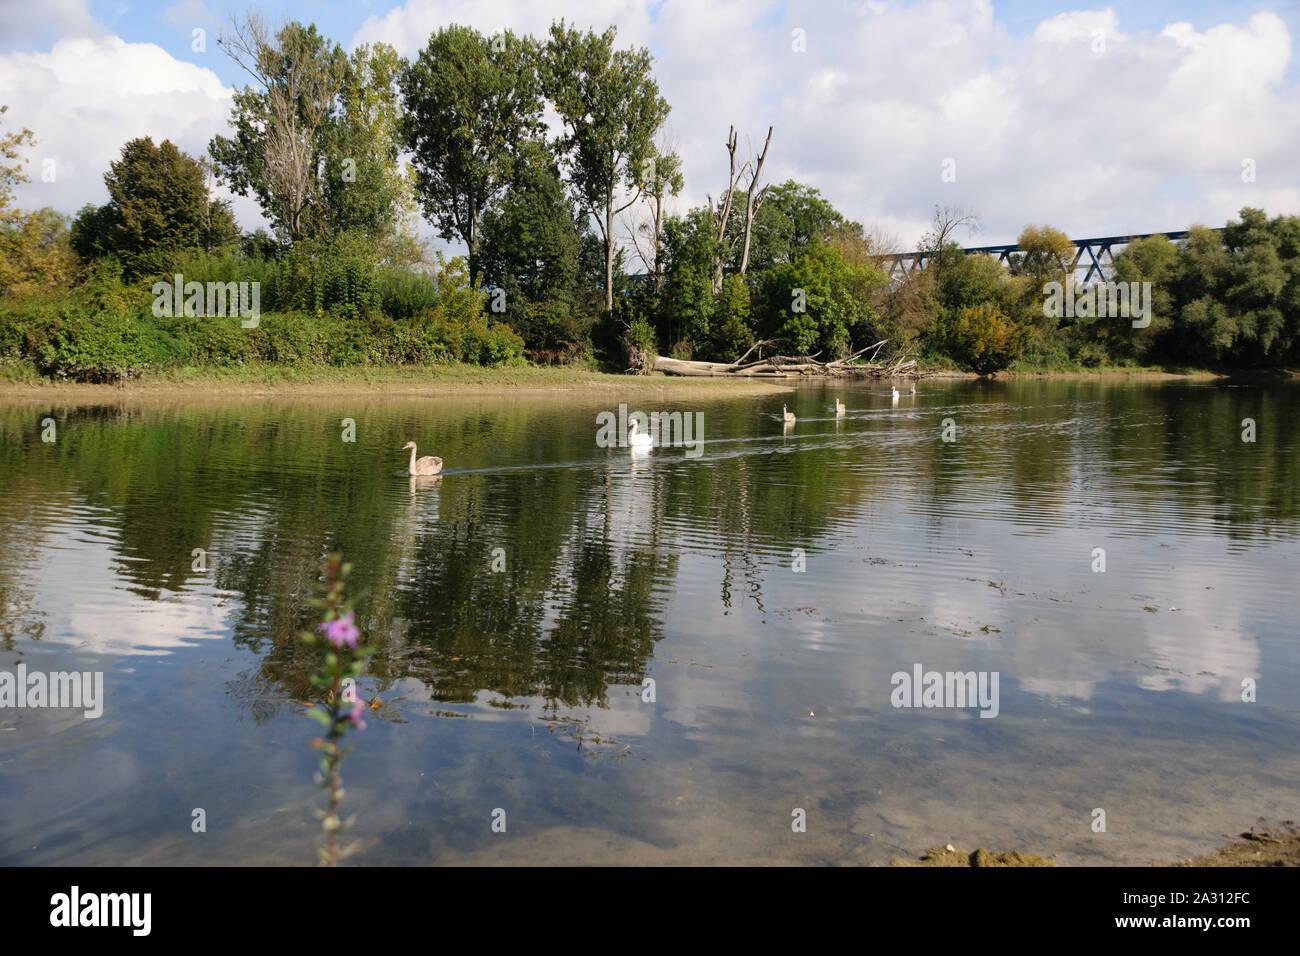 Swans on the river Donau Bavaria Germany Deggendorf /Schwäne auf der Donau Bayern Deggndorf Stock Photo